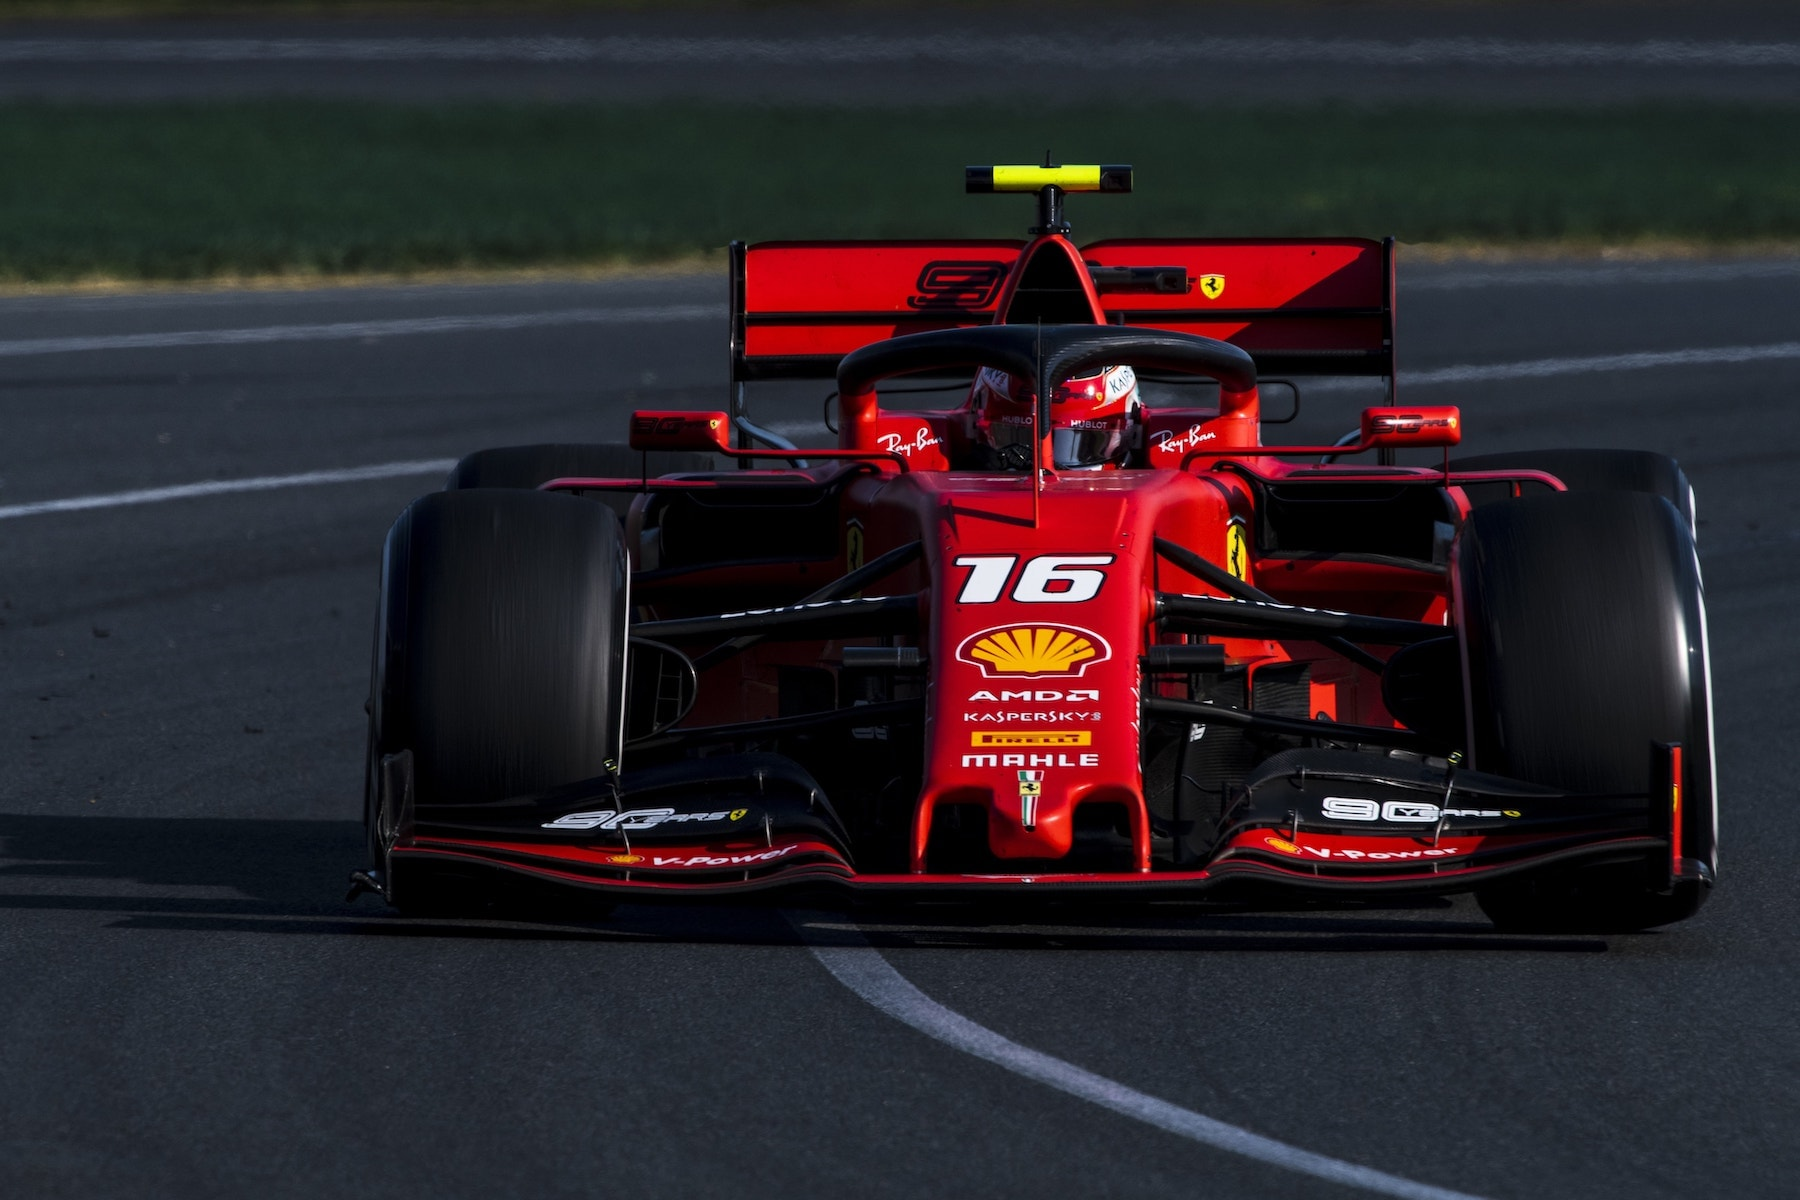 G 2019 Charles Leclerc | Ferrari SF90 | 2019 Australian GP P5 1 copy.jpg